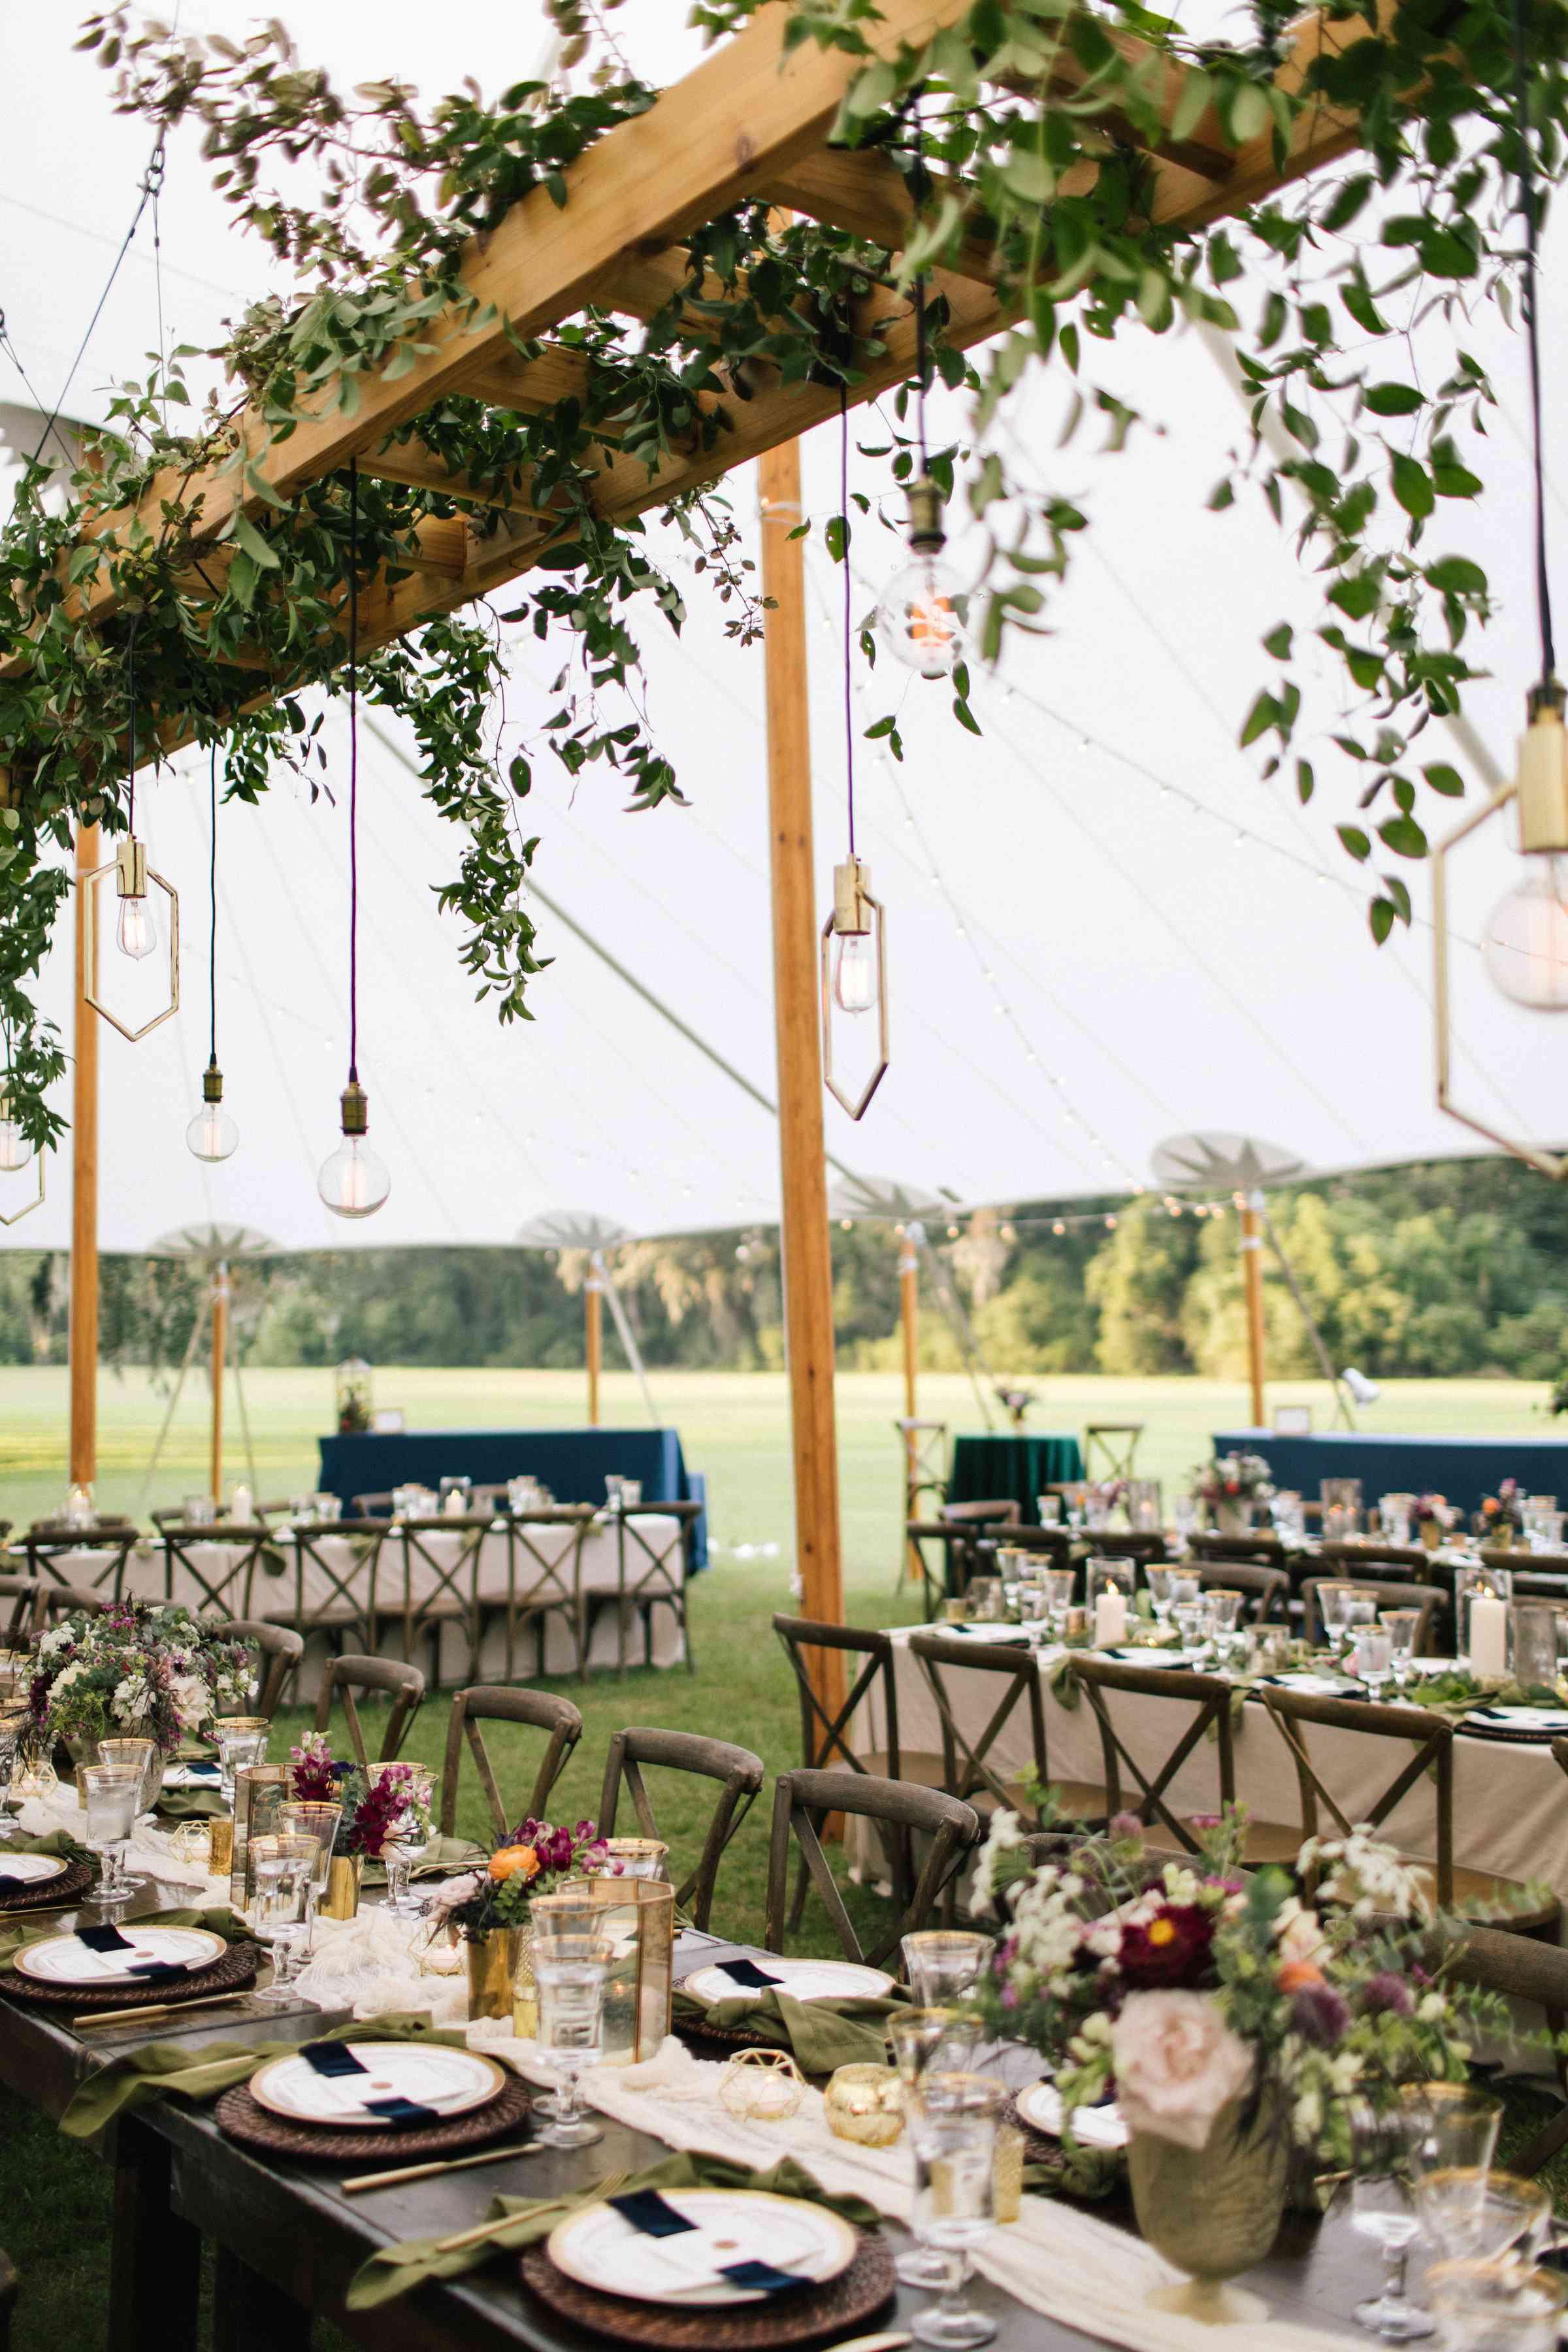 <p>Wedding Reception Greenery Overhang</p><br><br>